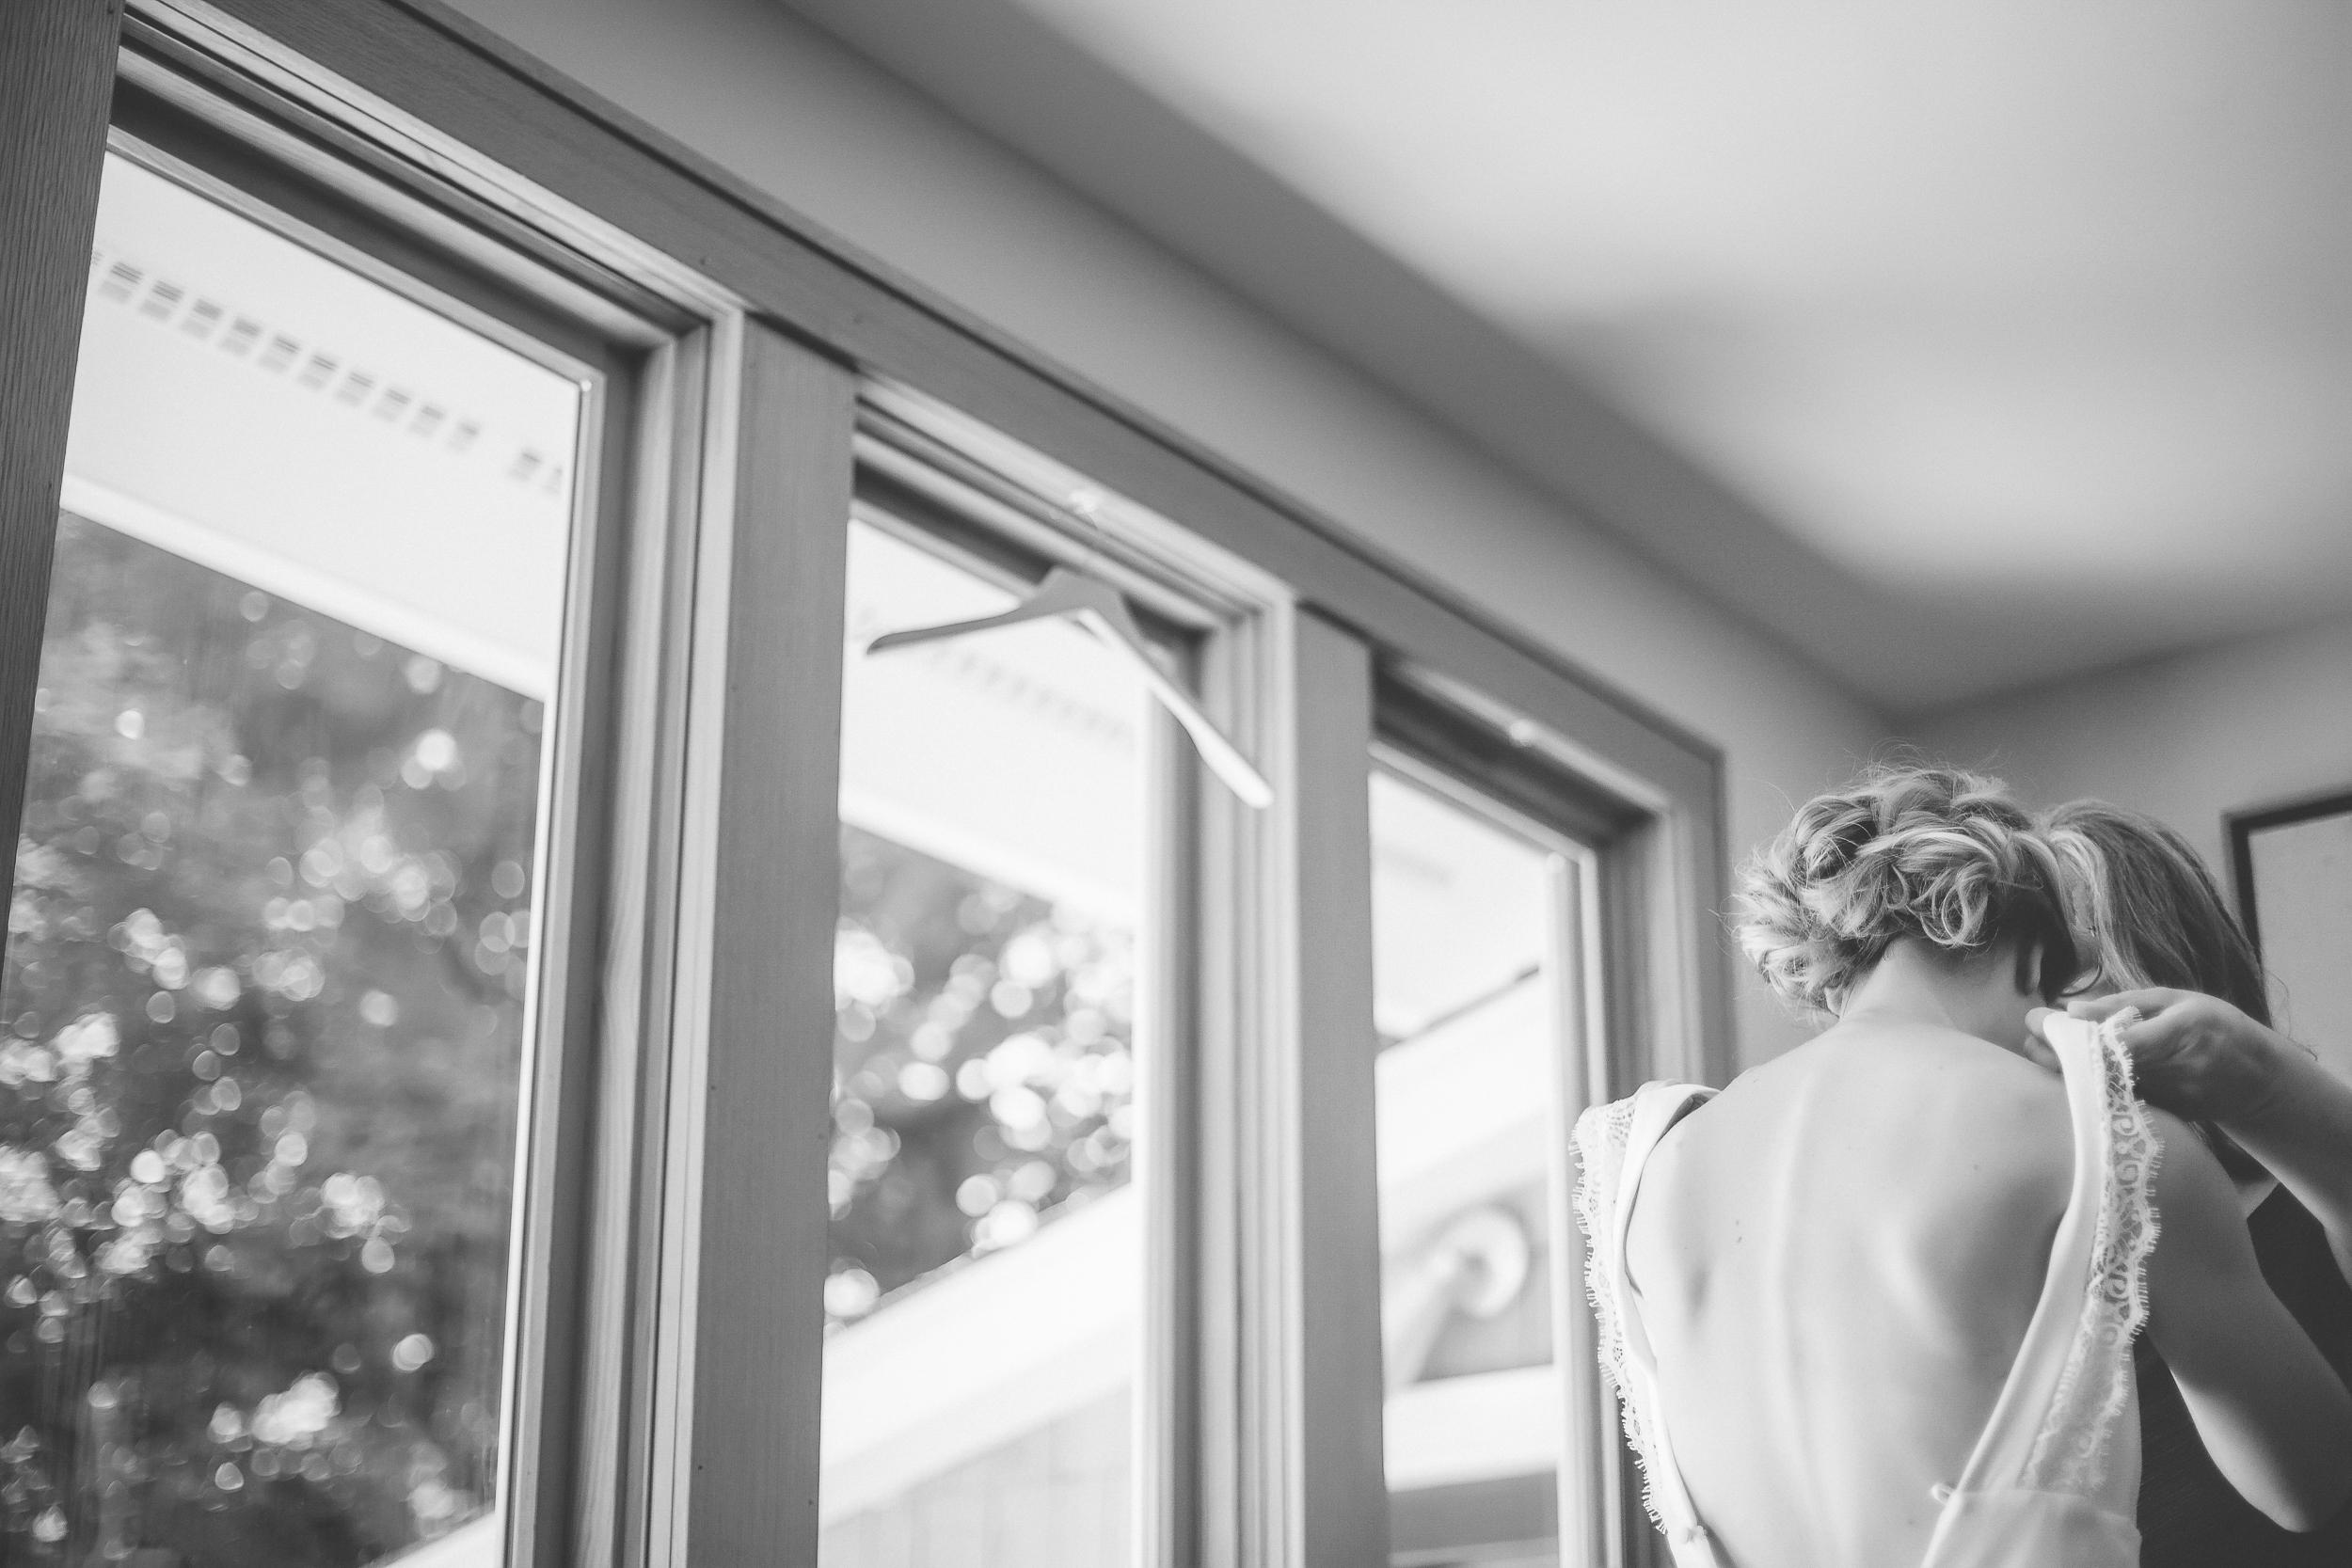 17 Minneapolis home backyard wedding bride putting on dress.jpg